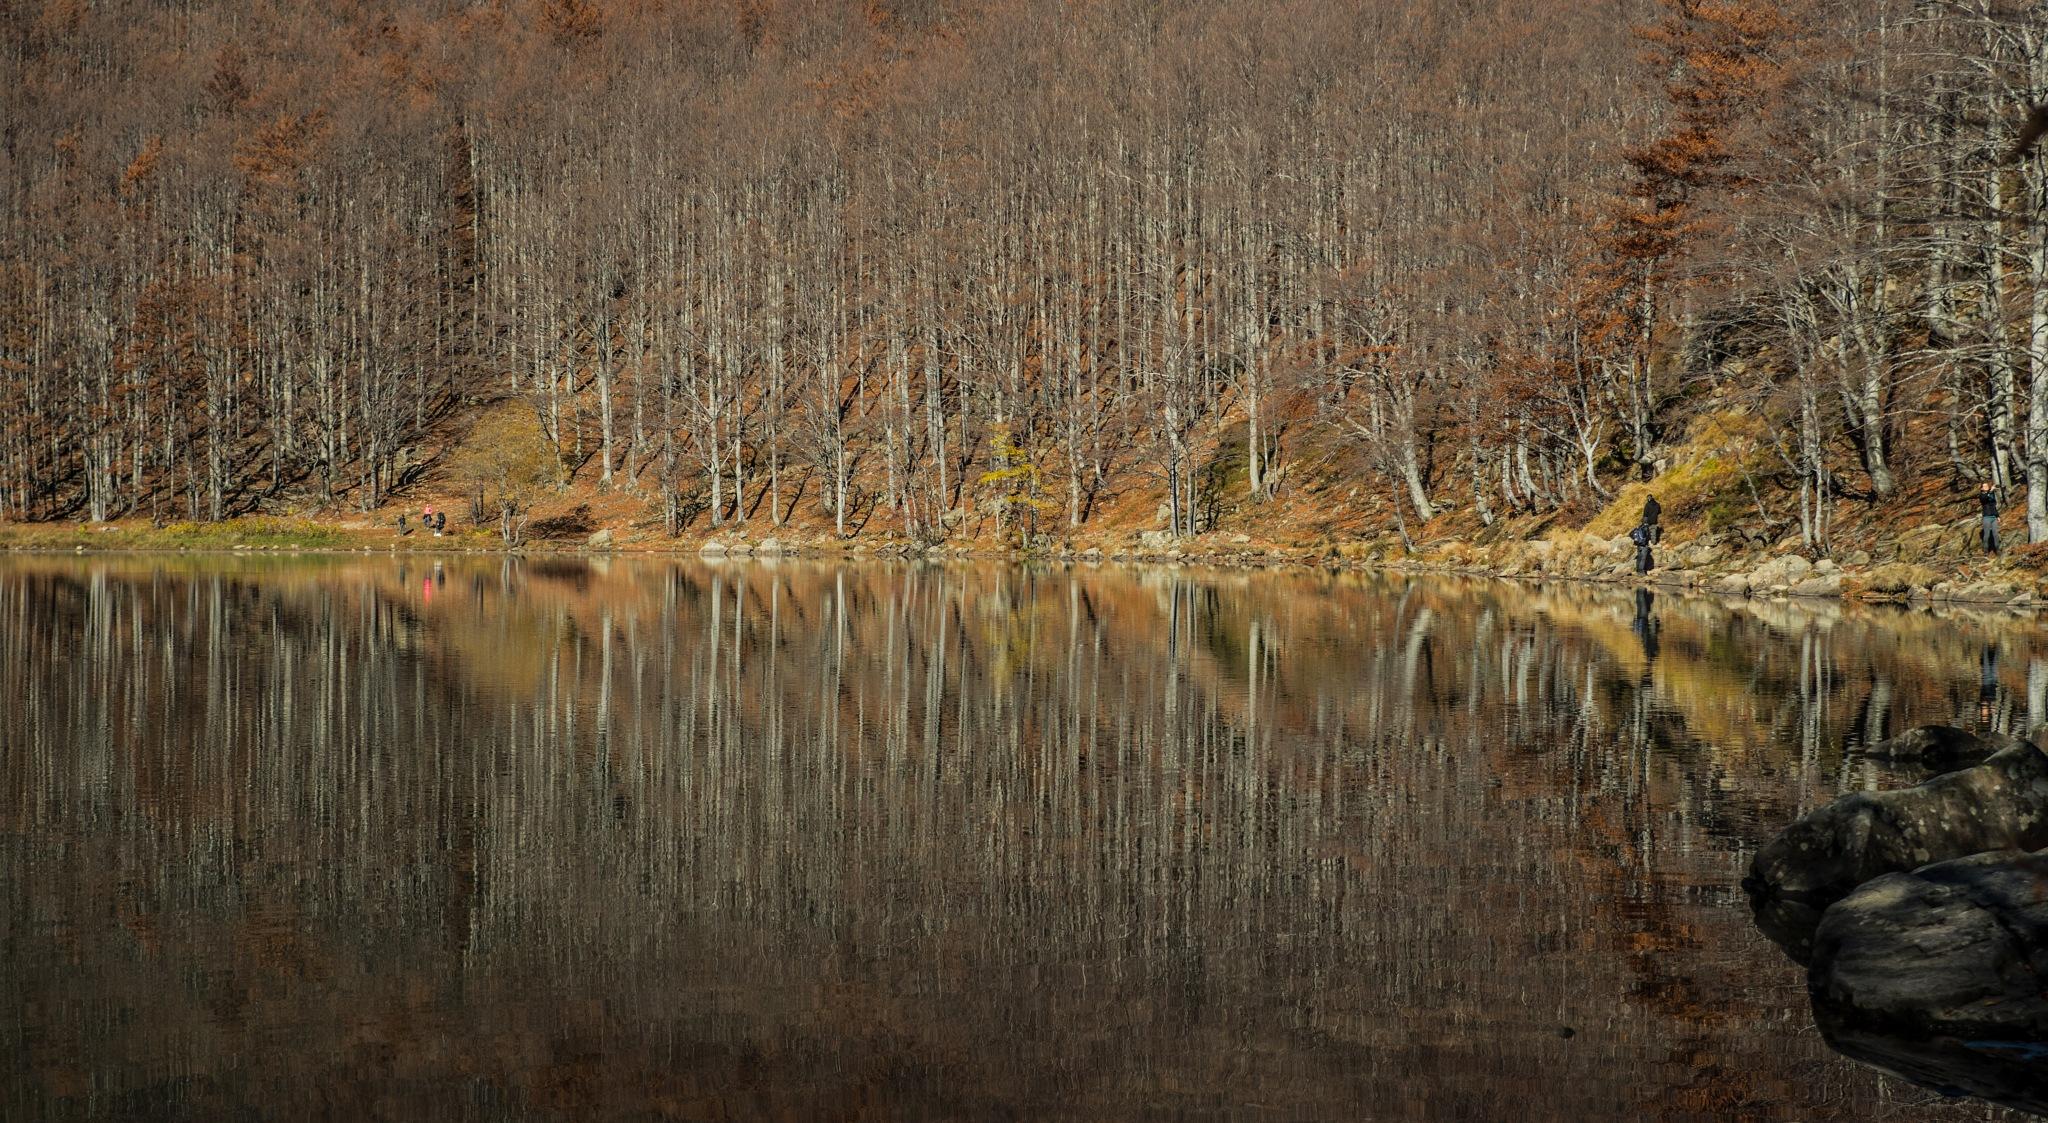 Reflexions by Daniele Vecchi